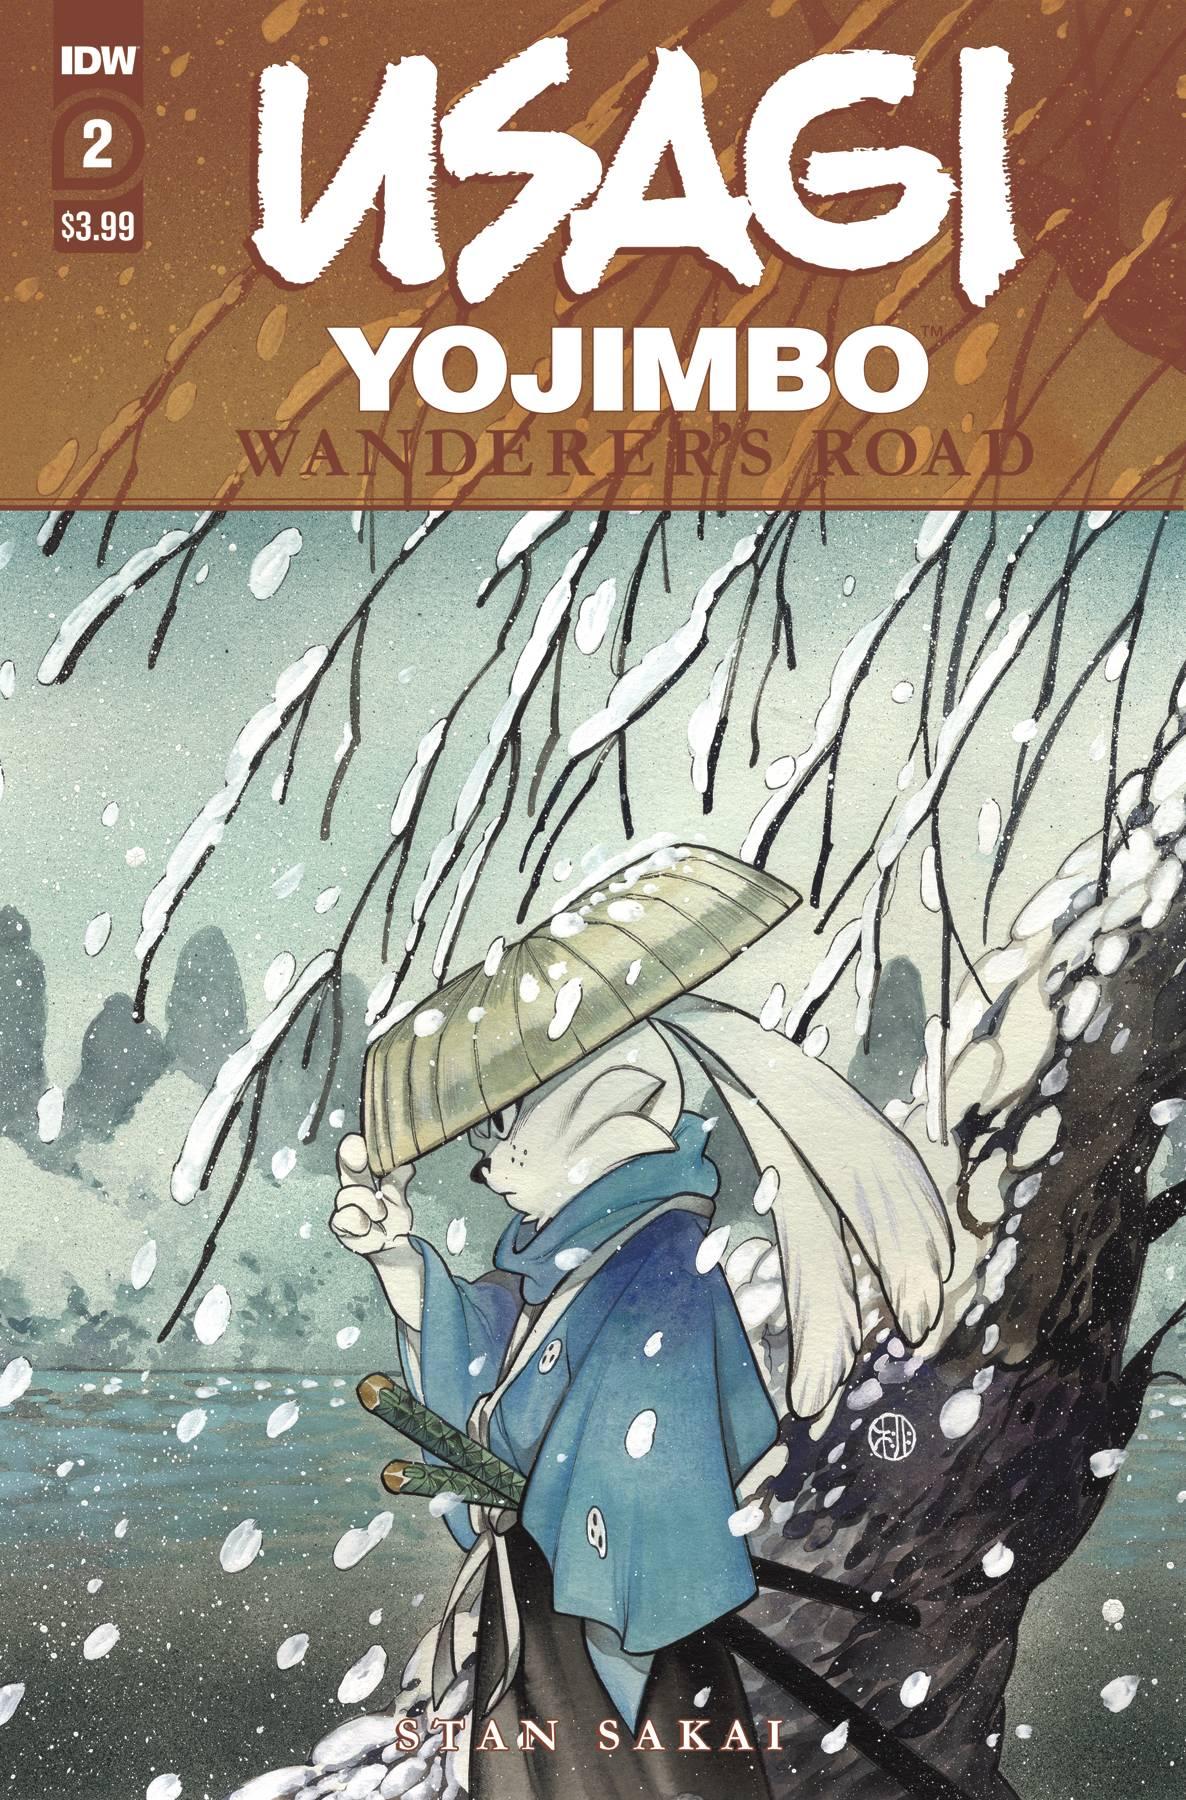 Usagi Yojimbo: Wanderers Road #2 (2020)